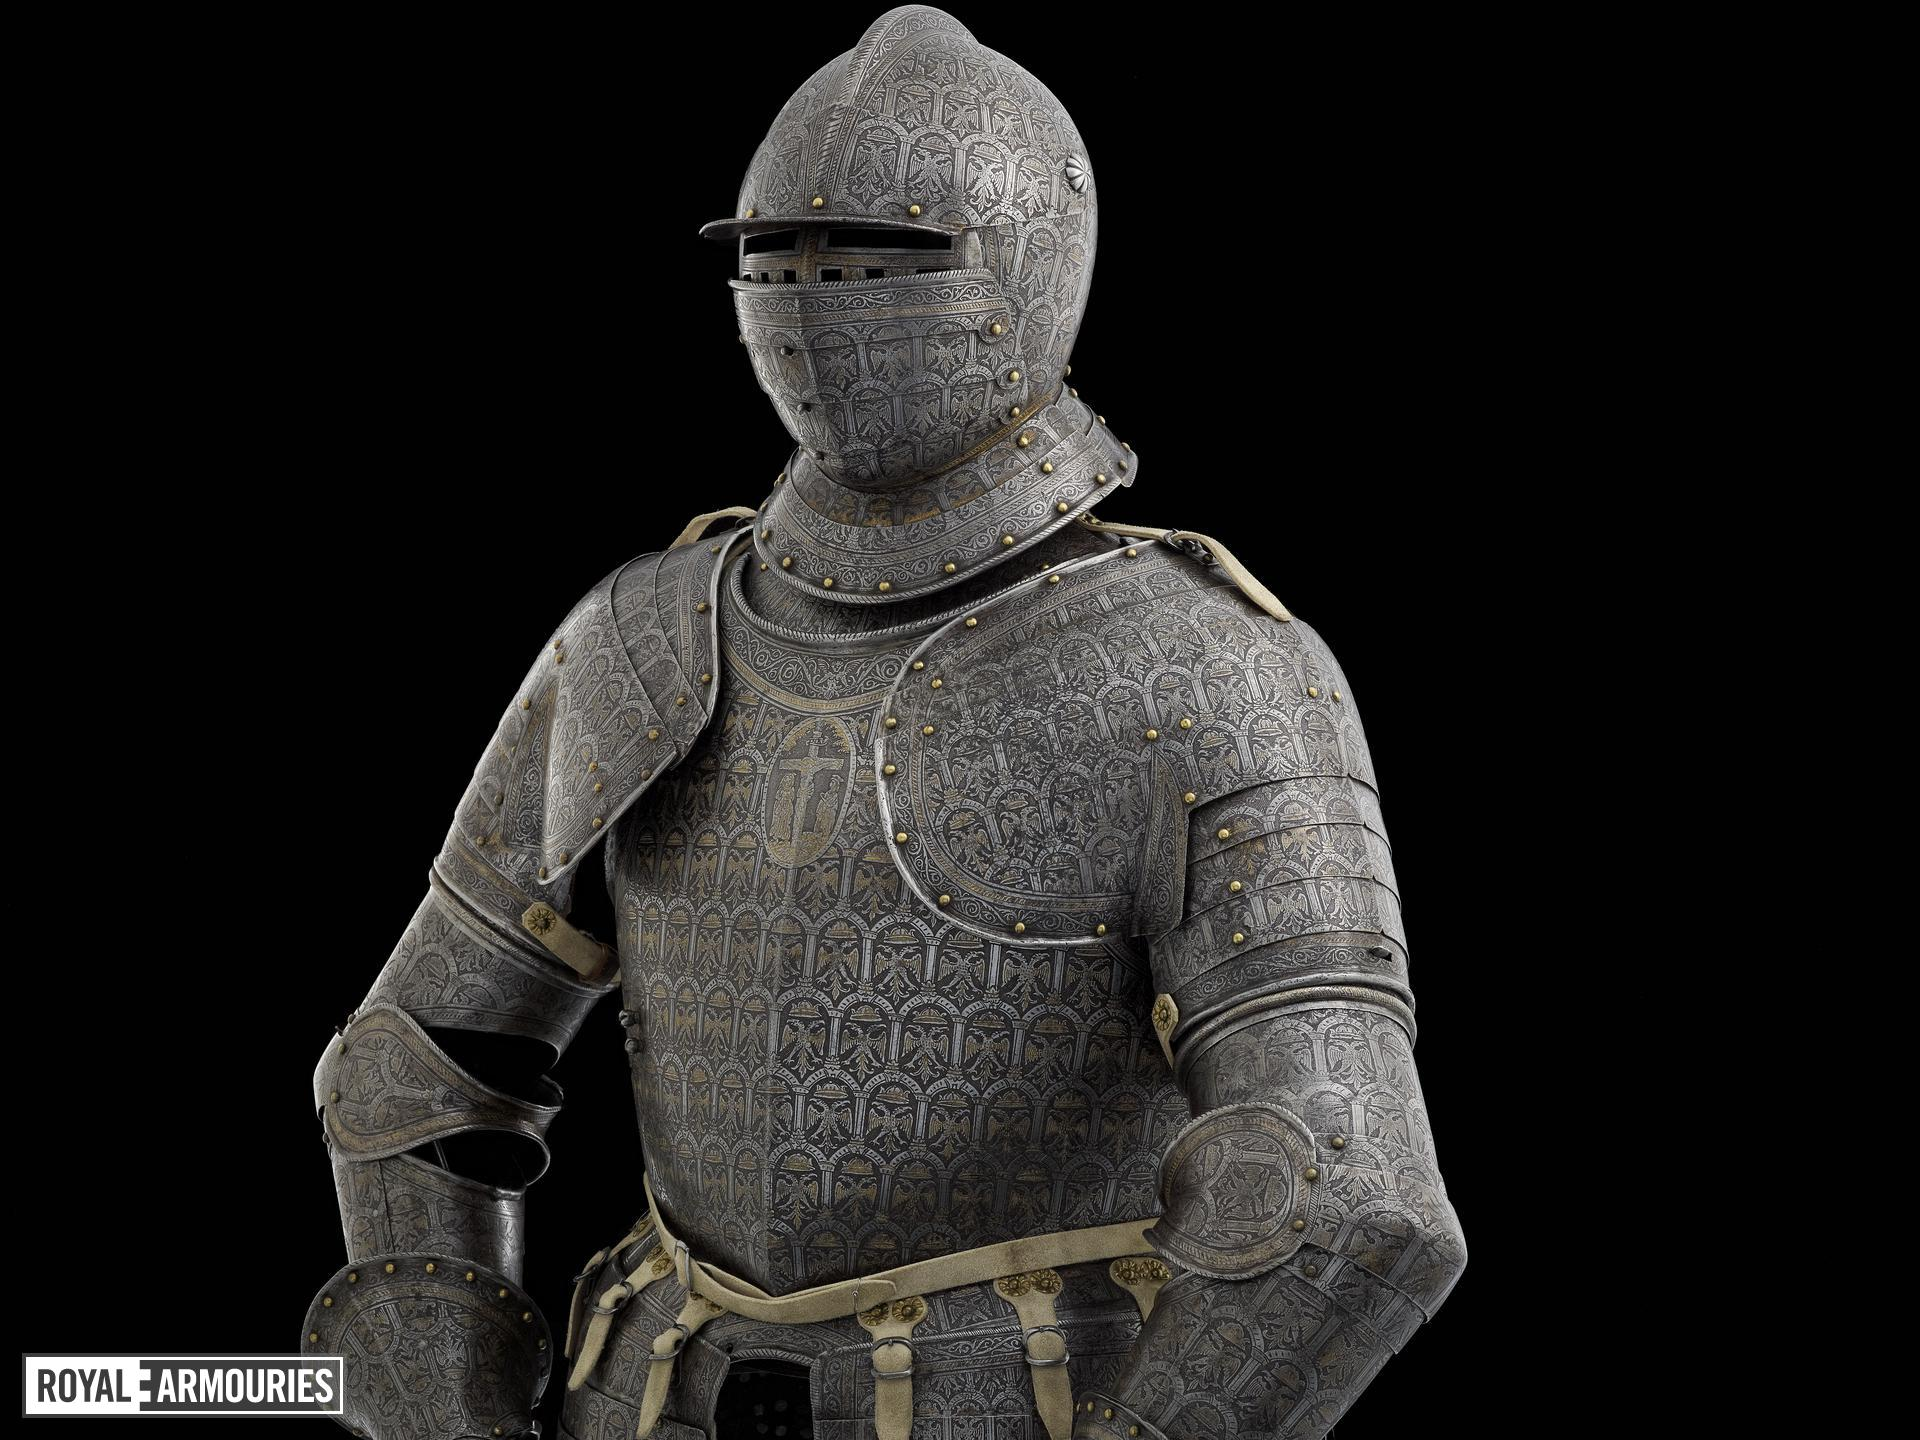 Demilance armour